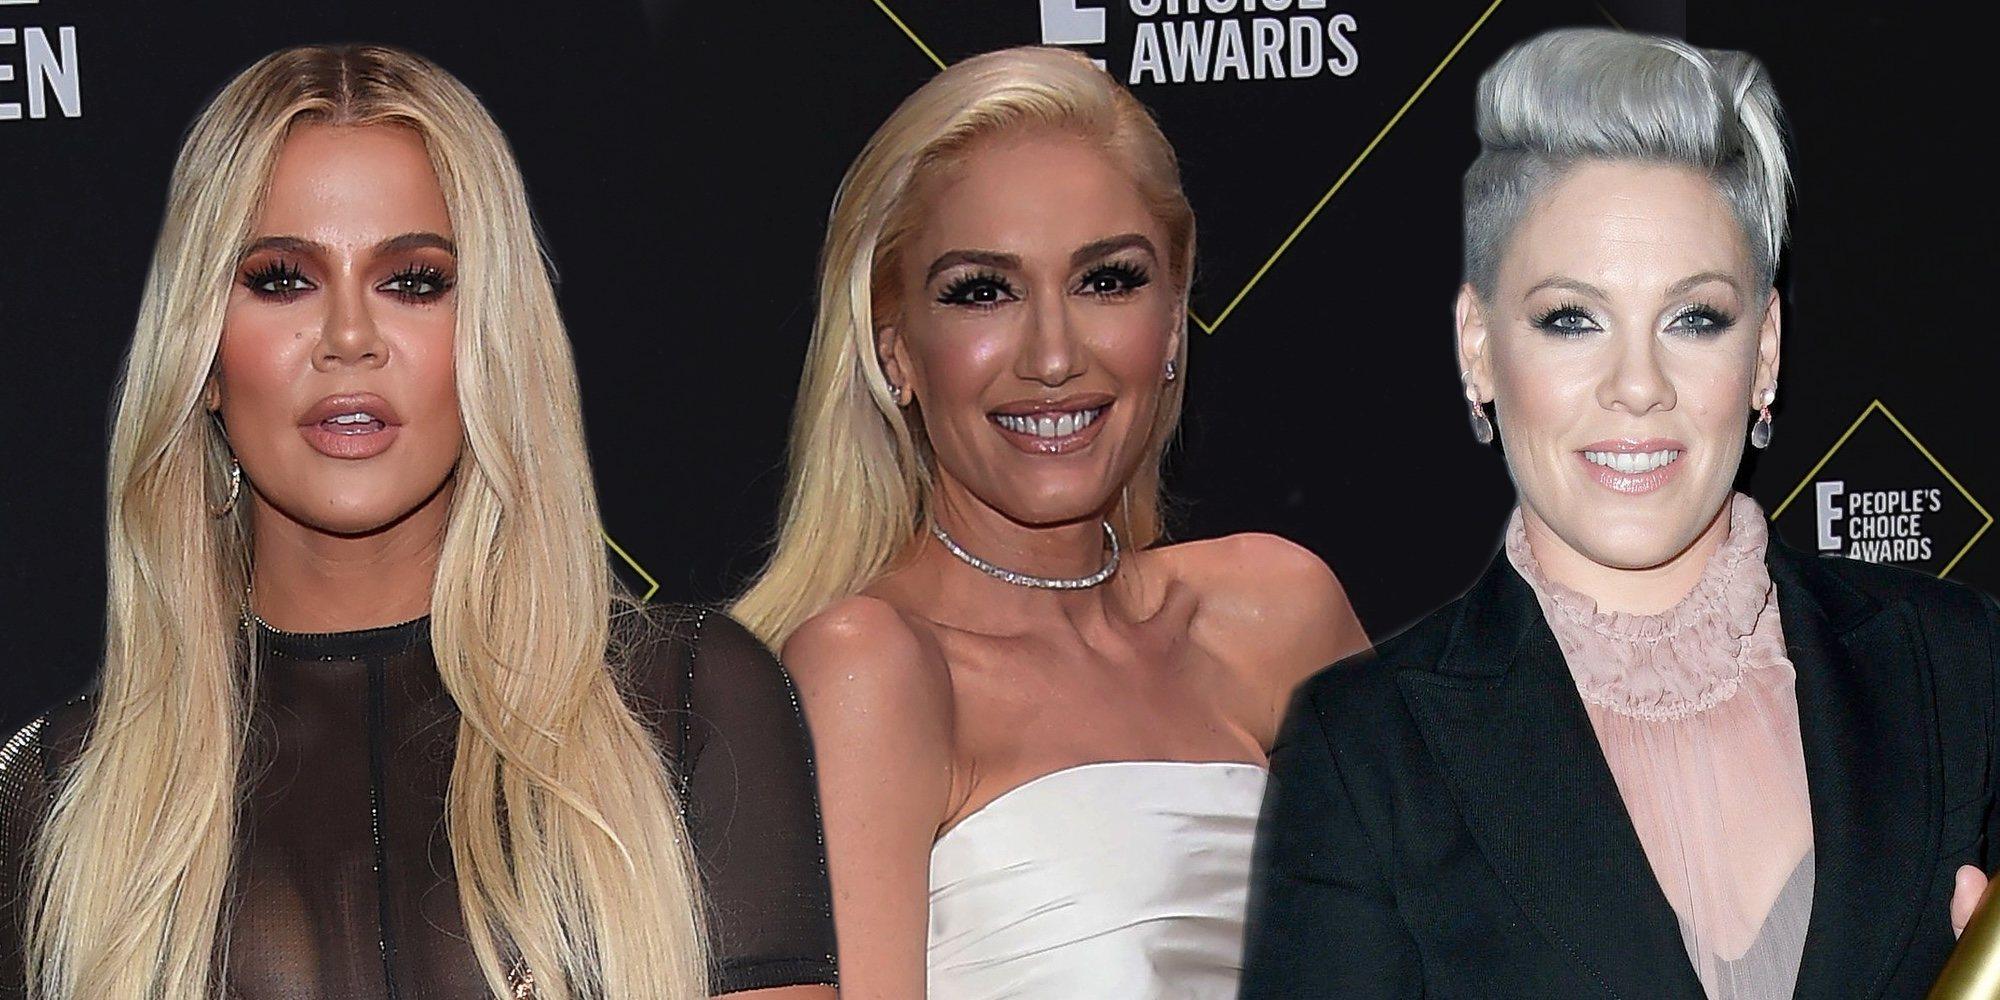 Khloe Kardashian, Gwen Stefani y Pink triunfan en los People's Choice Awards 2019